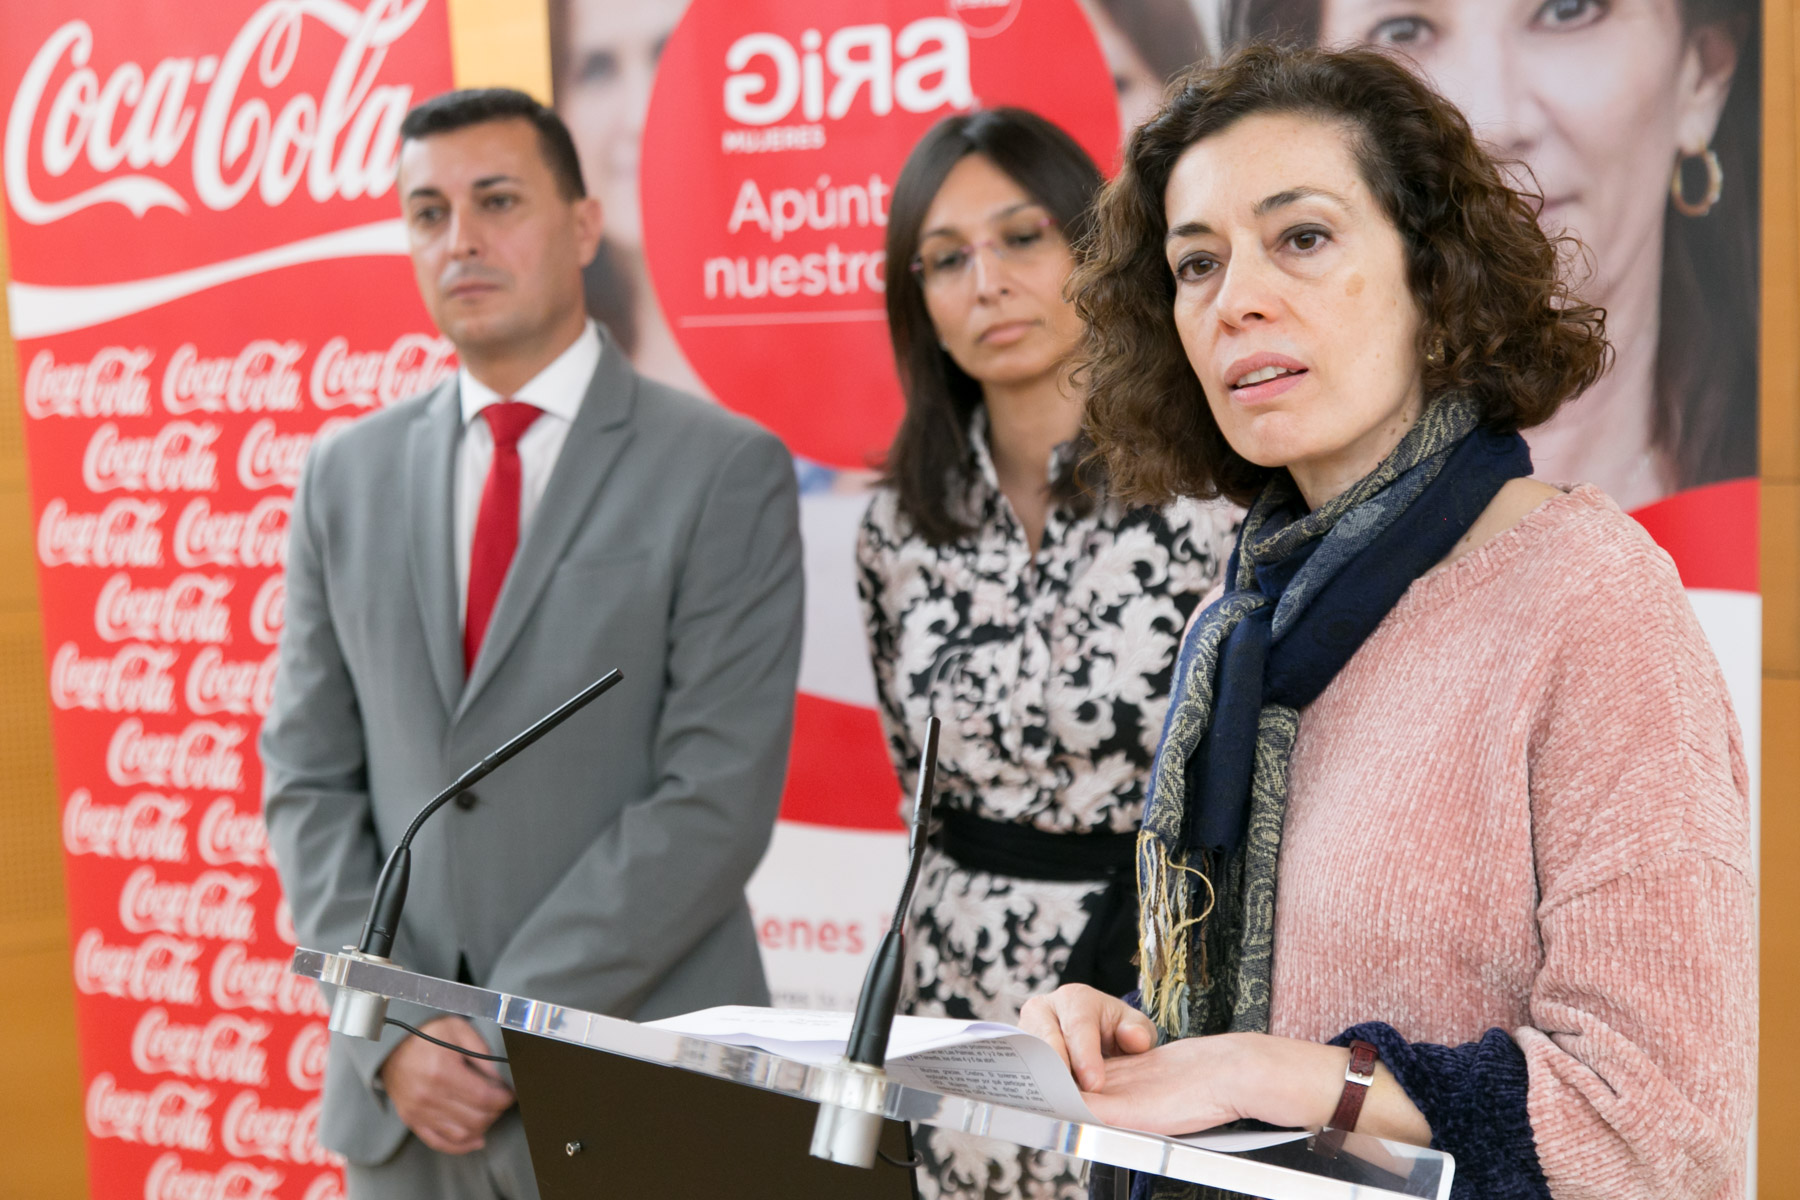 Gira Mujeres CocaCola 24